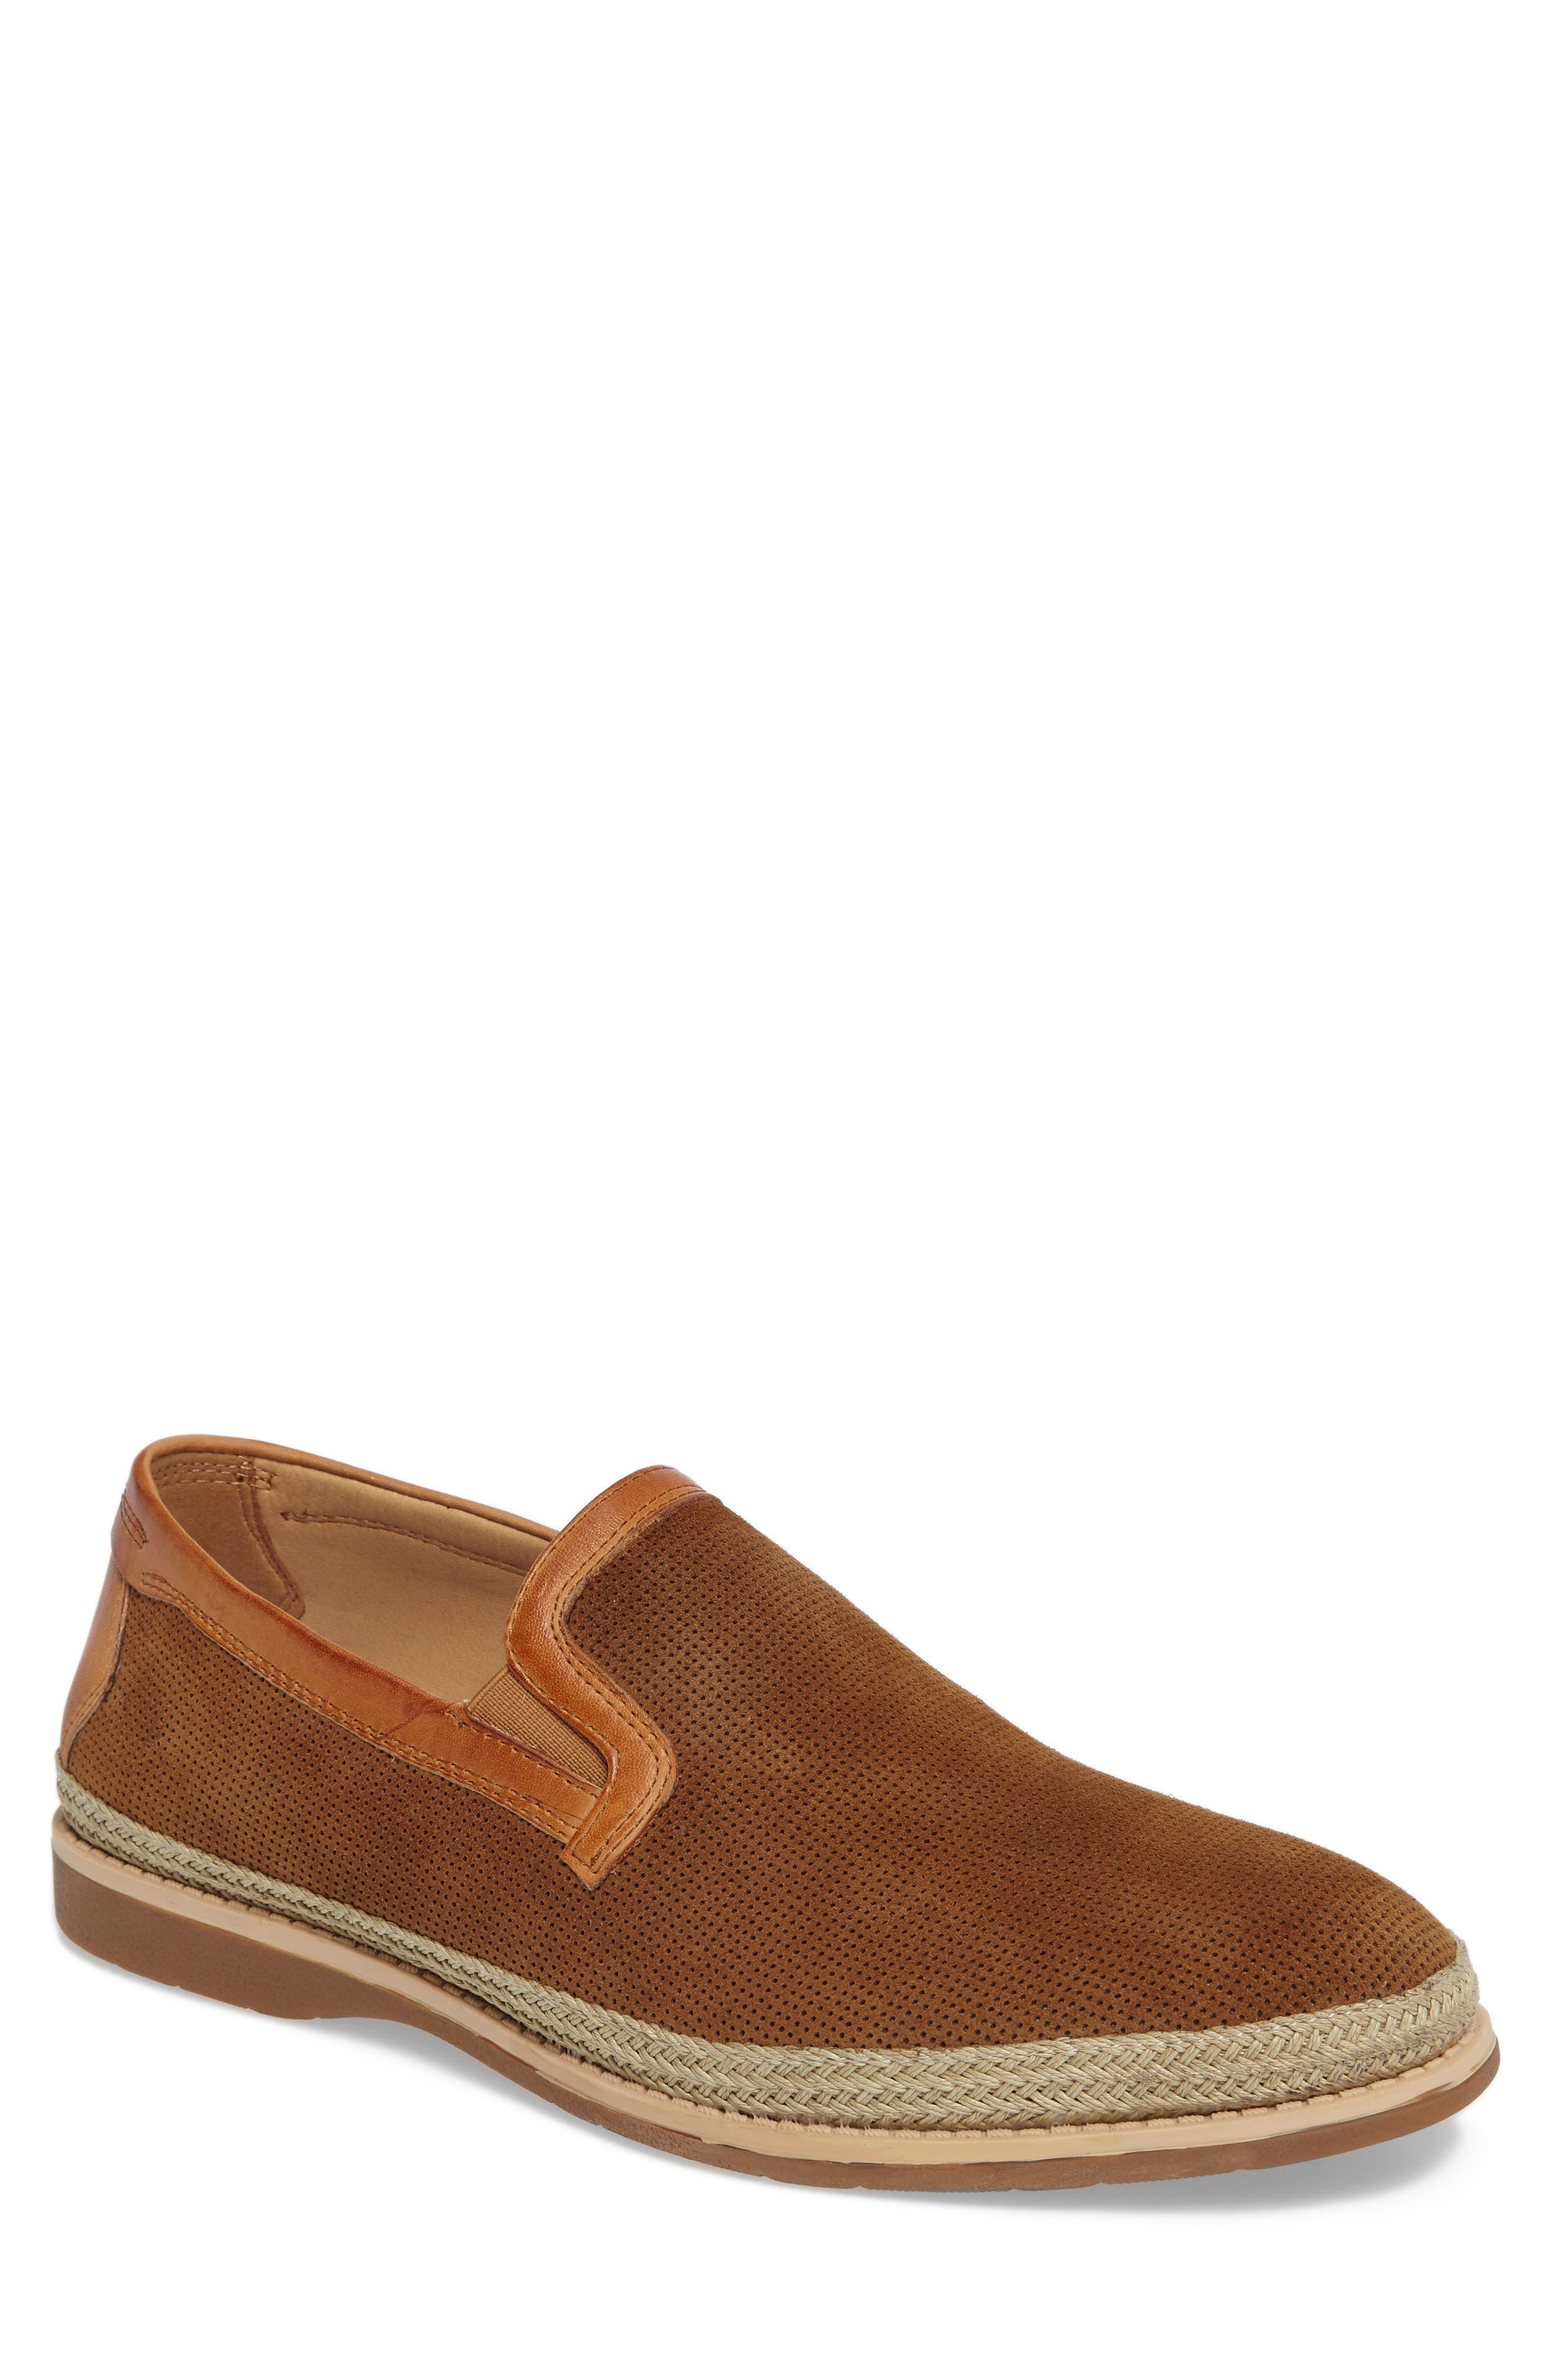 Goldhawk Slip-On,                         Main,                         color, Camel Suede